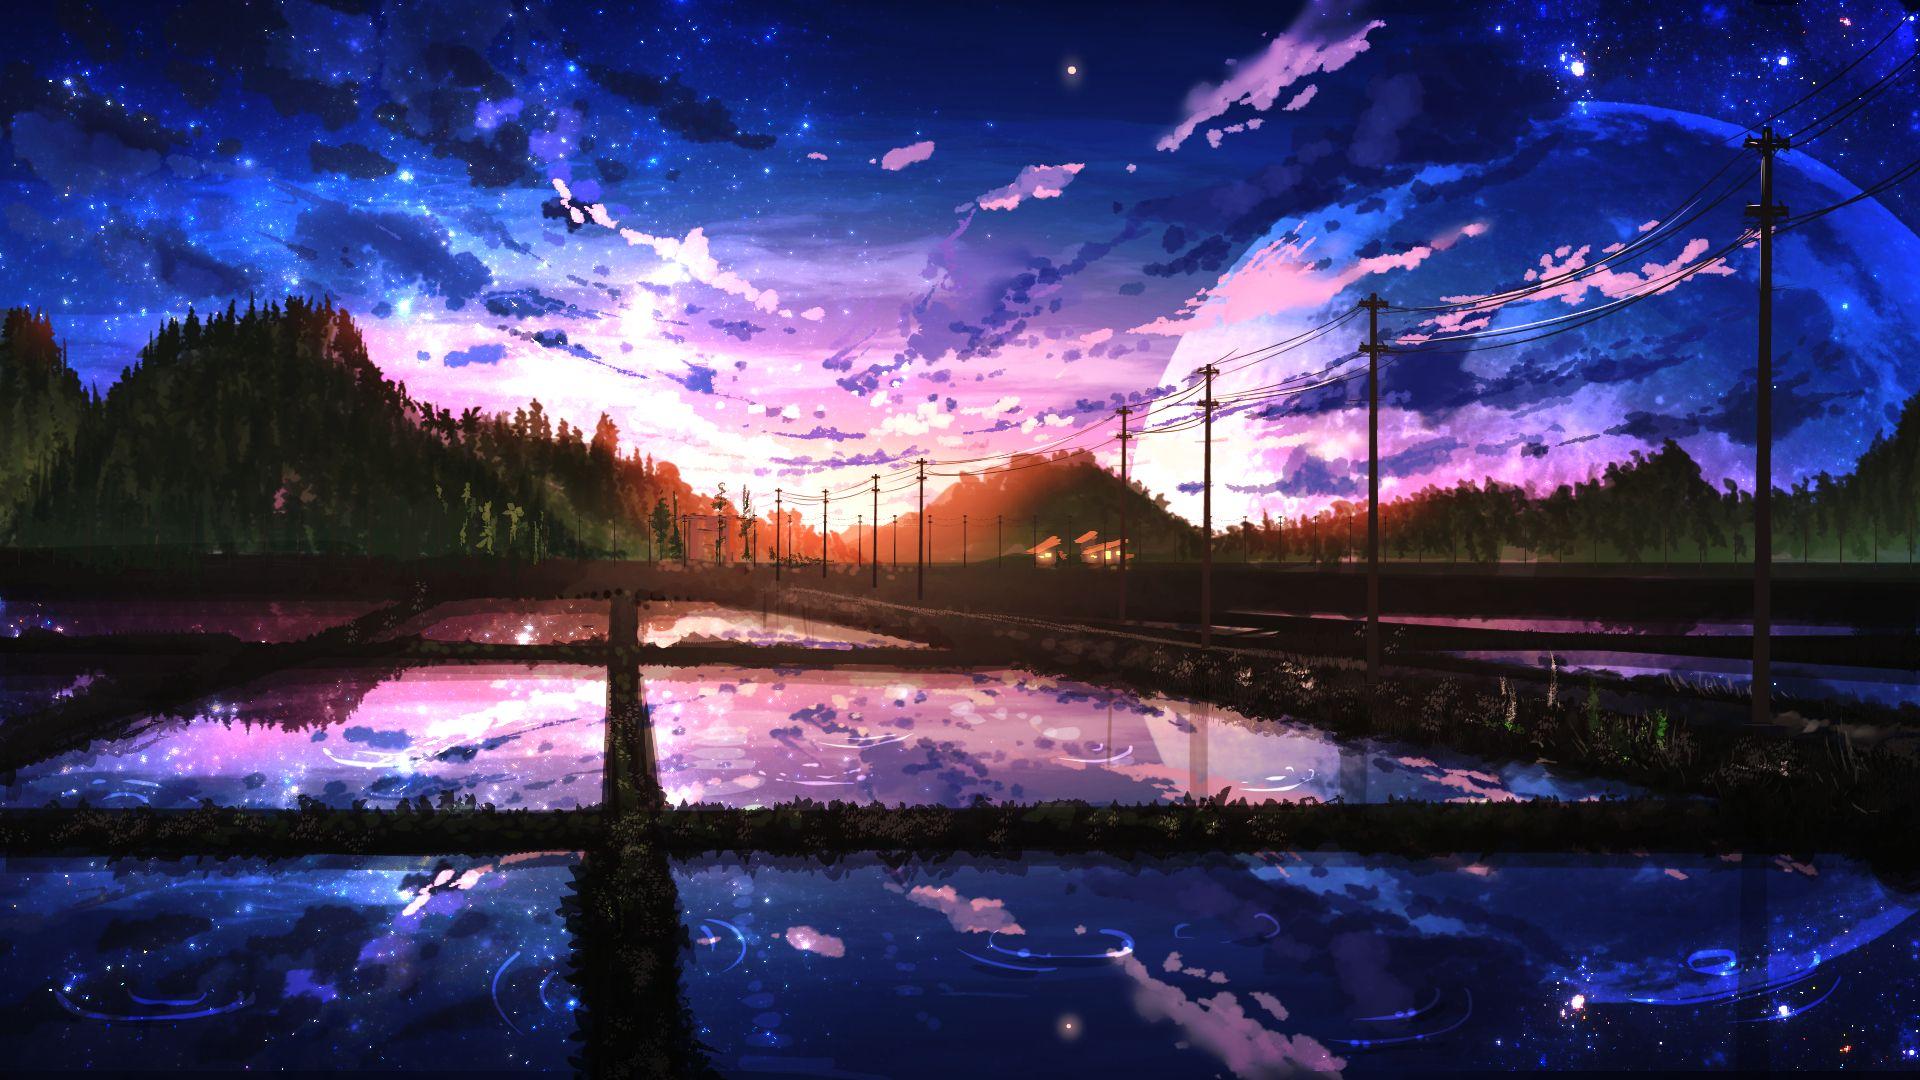 anime scenery desktop wallpaper